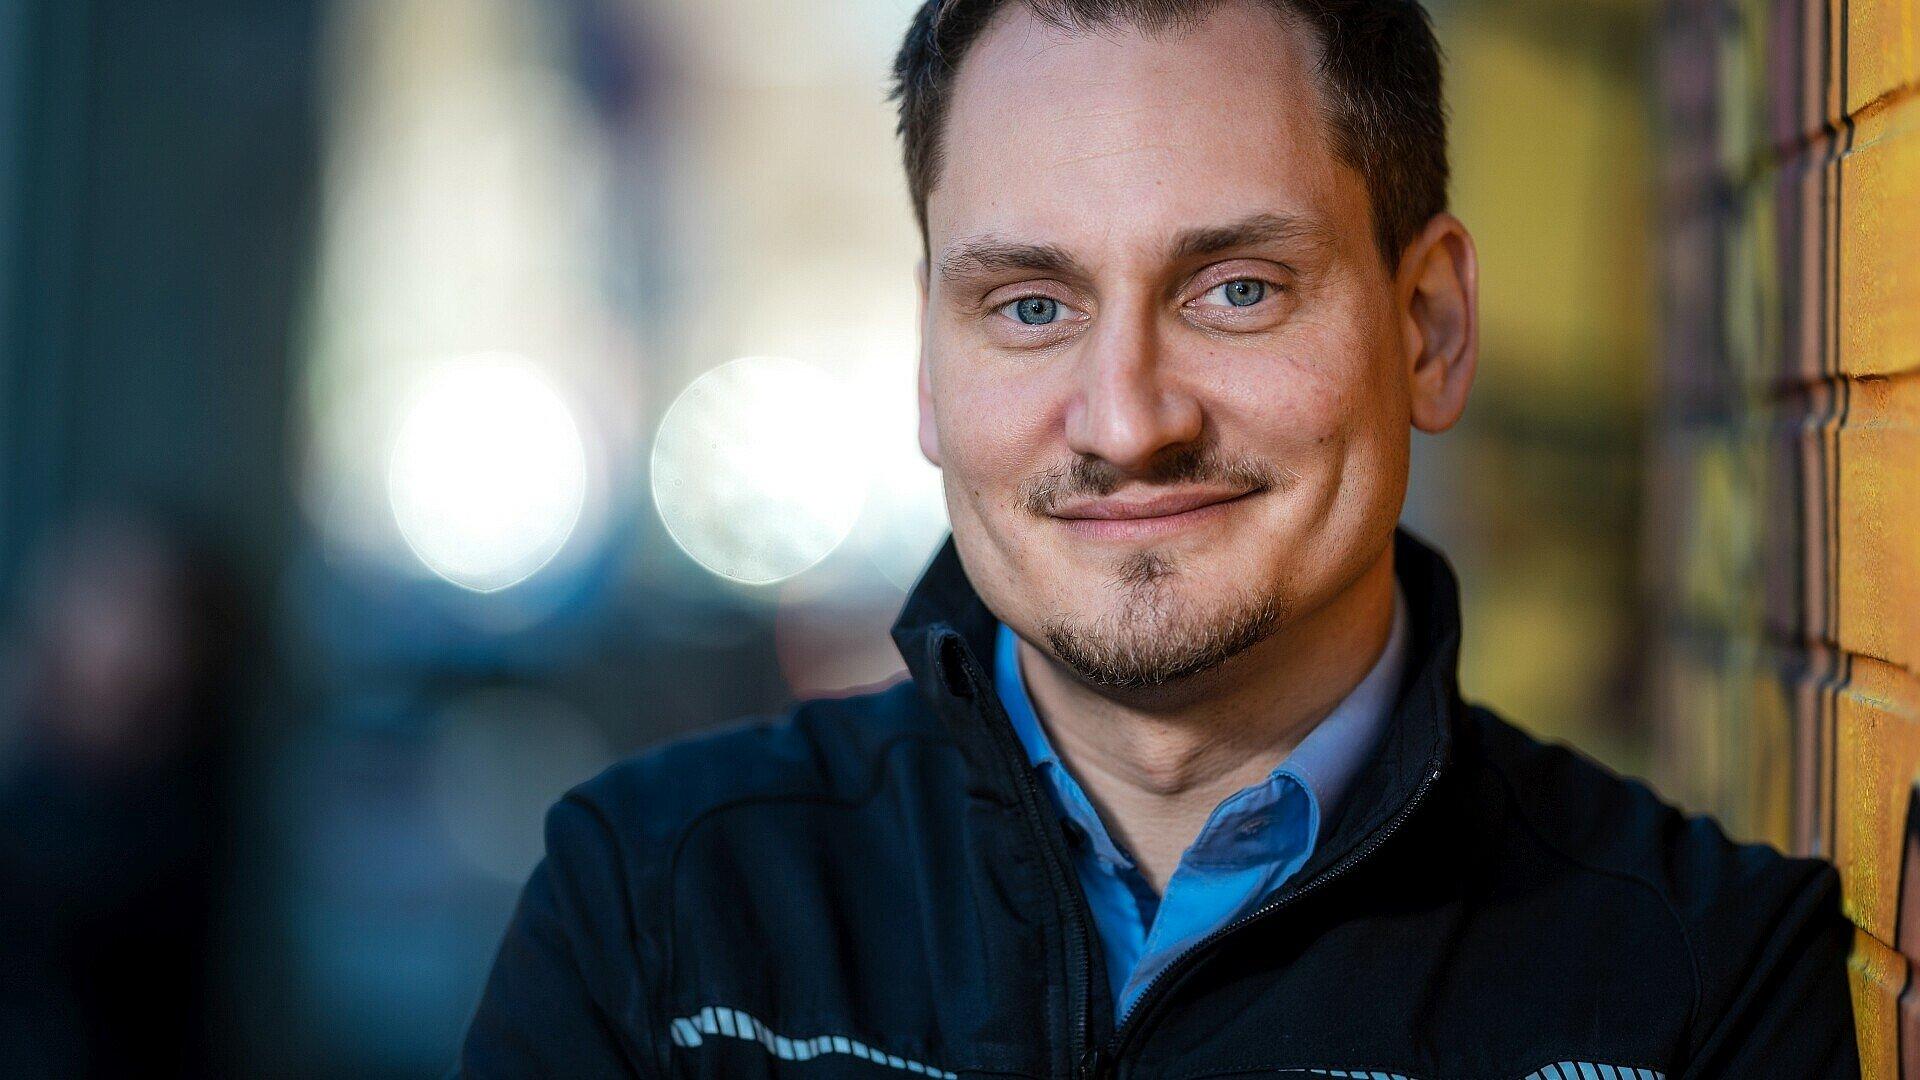 Niklas Zagolla vom Umzugsunternehmen ZBV Fels GmbH